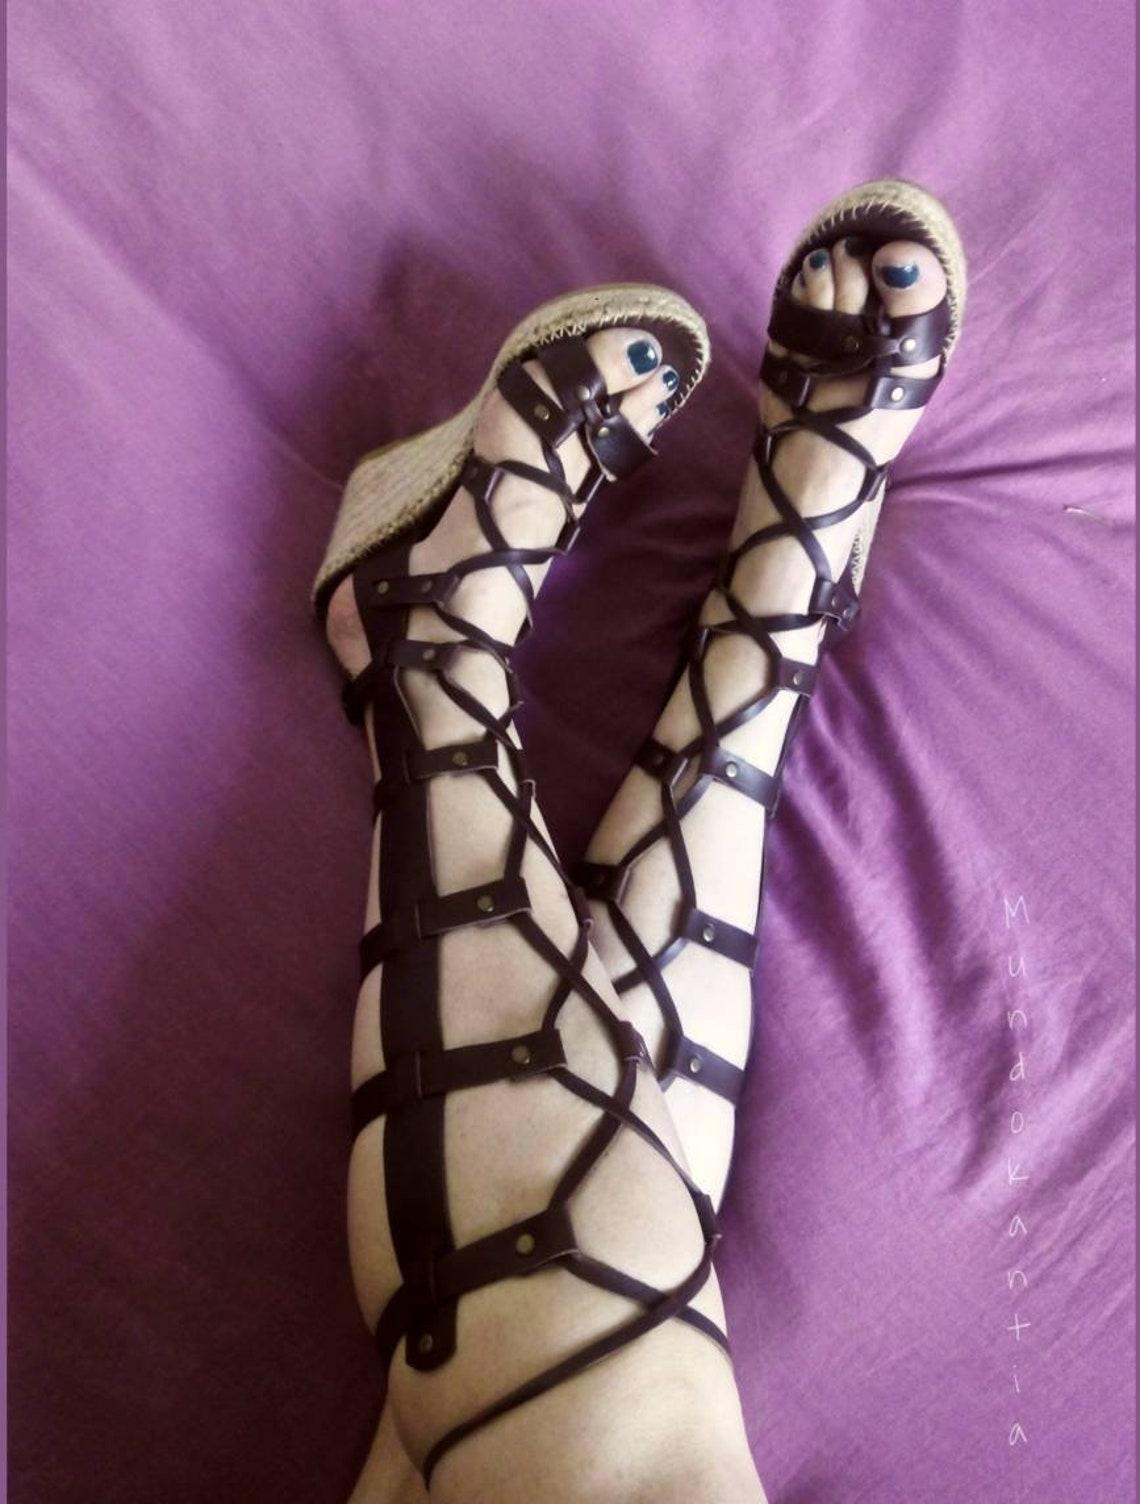 Sandalias gladiadoras negras. Sandalia espadrille romana tiras largas. Sandalia romana cuña alta. Sandalia gladiadora tiras hasta rodilla